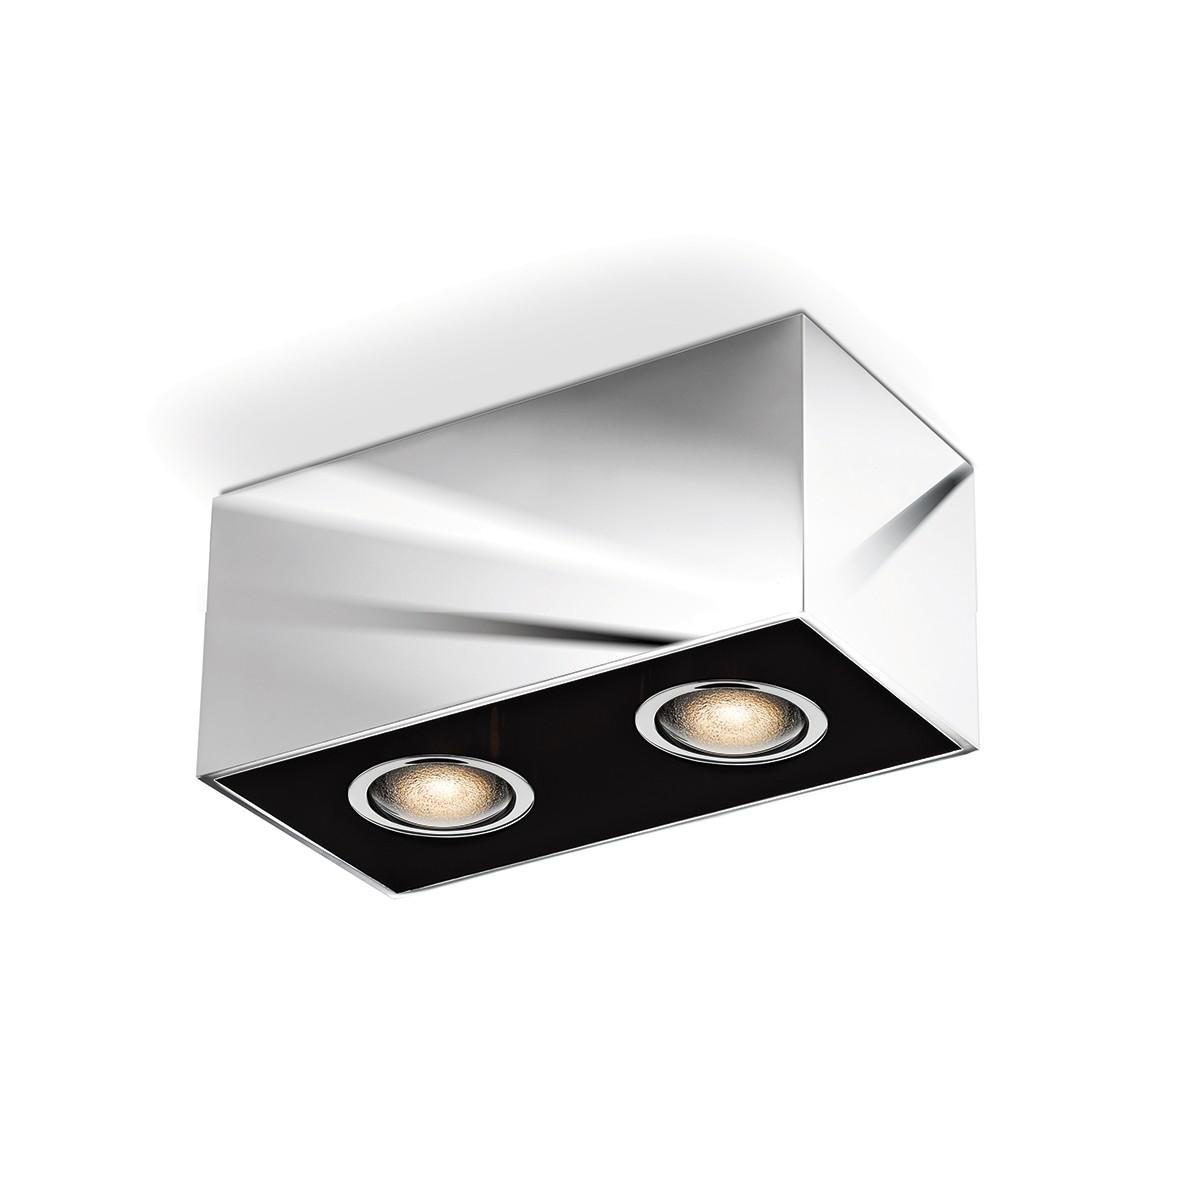 Bruck Cranny Spot LED Duo C Deckenleuchte, Chrom